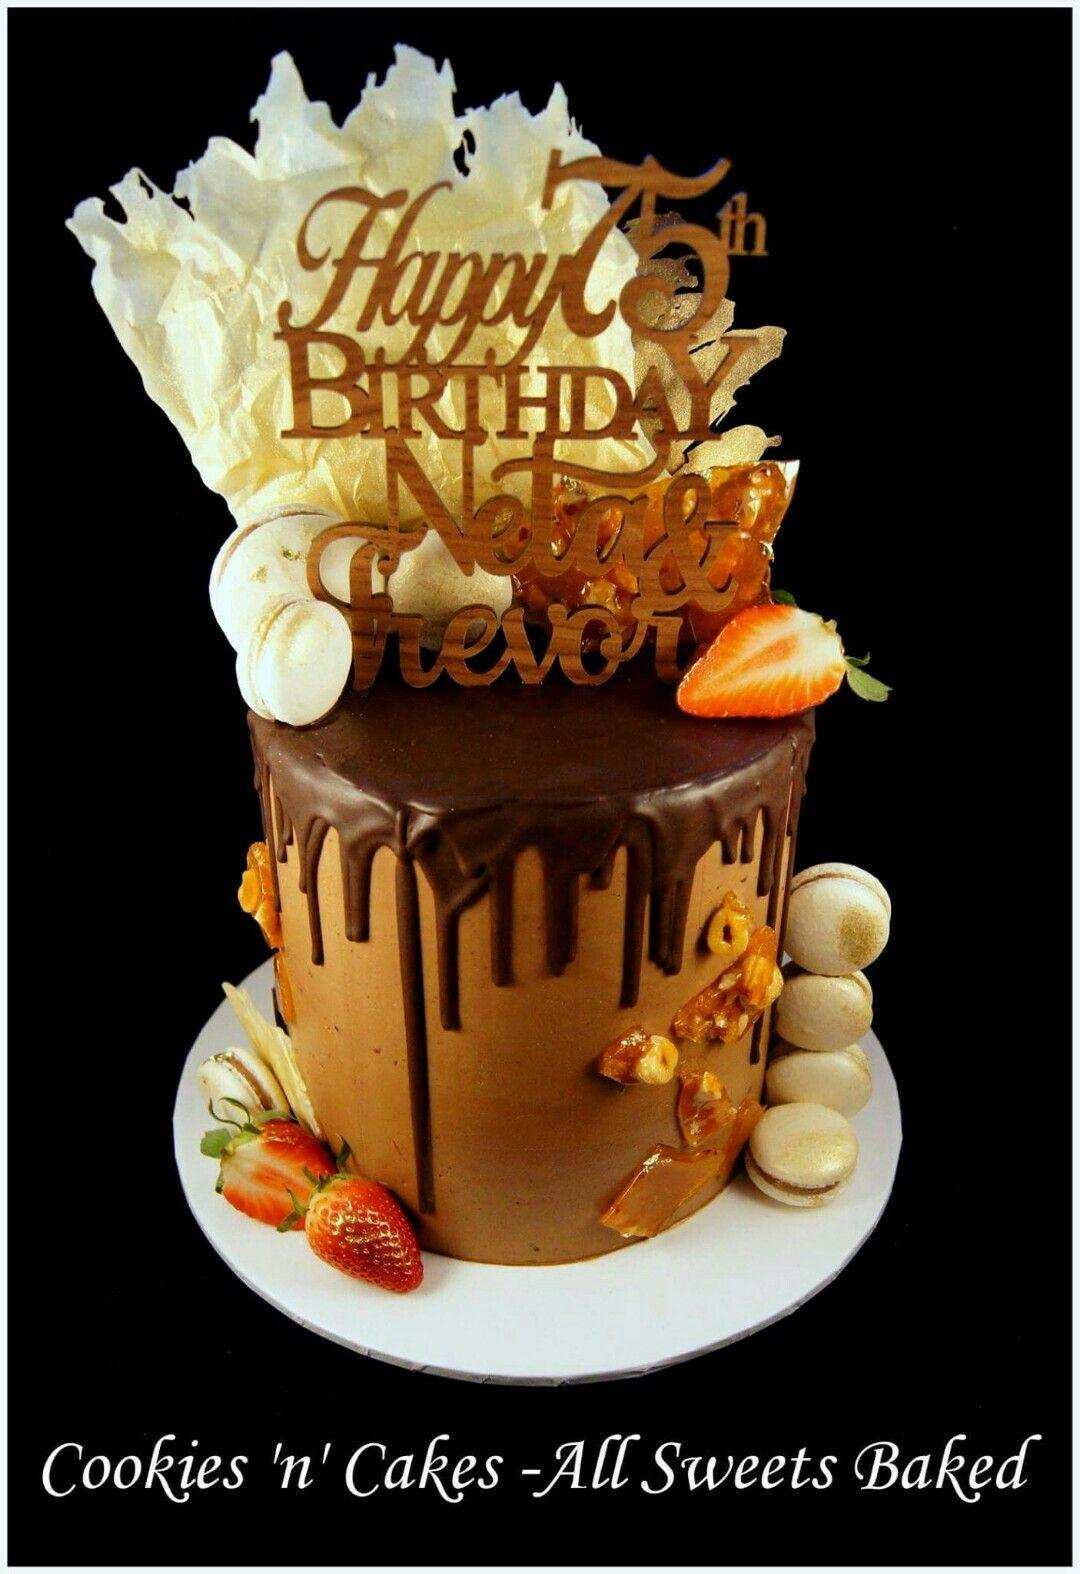 57th birthday drip cake chocolate shards macarons hazelnut